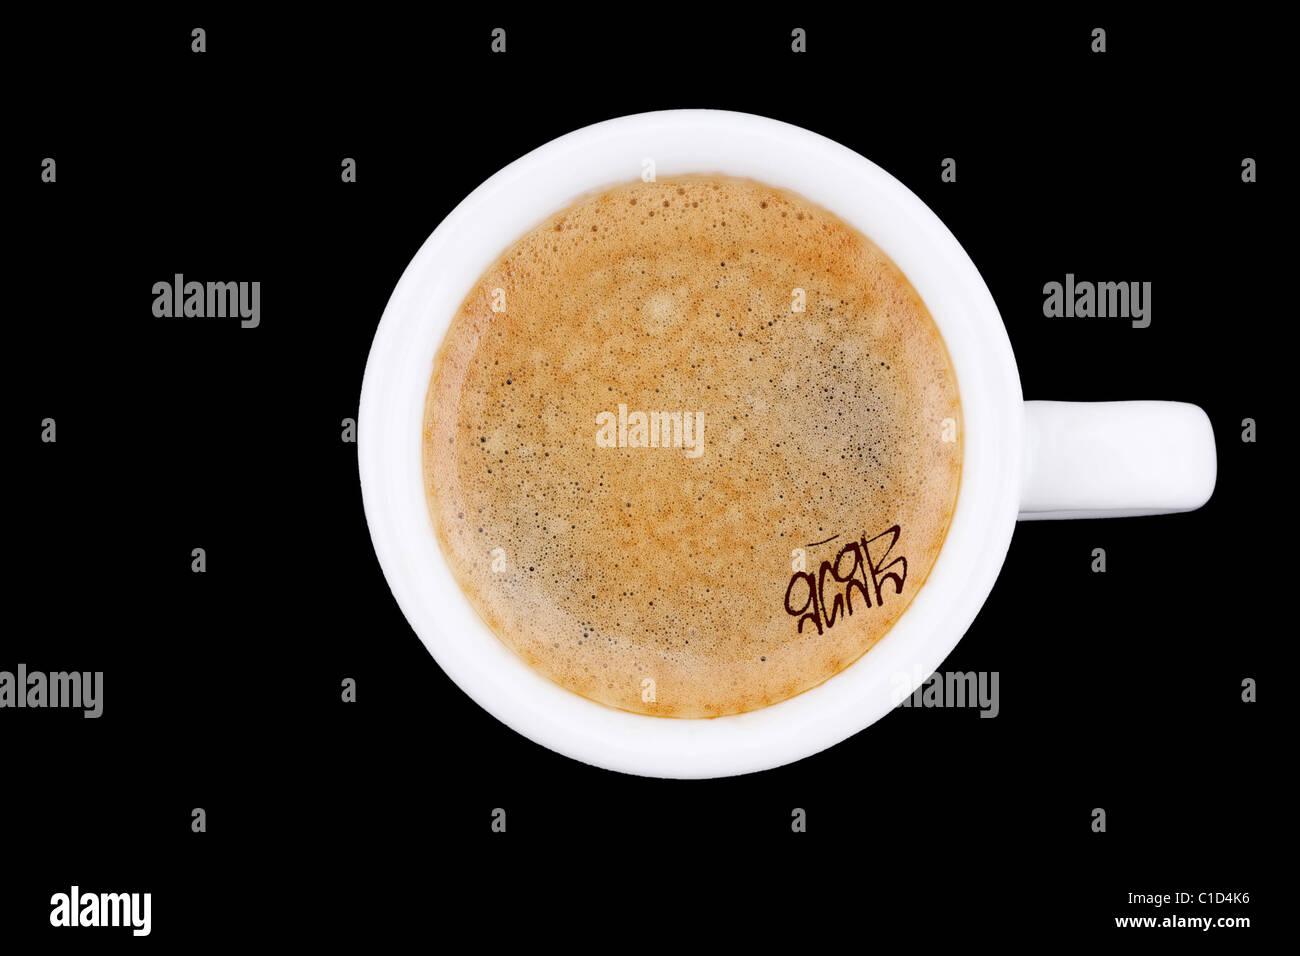 digitale Verbesserung - Clip Bild - Graffito Spitznamen Tag 9G9B auf Café Crema Kaffee Schaum - Symbolik für Stockbild